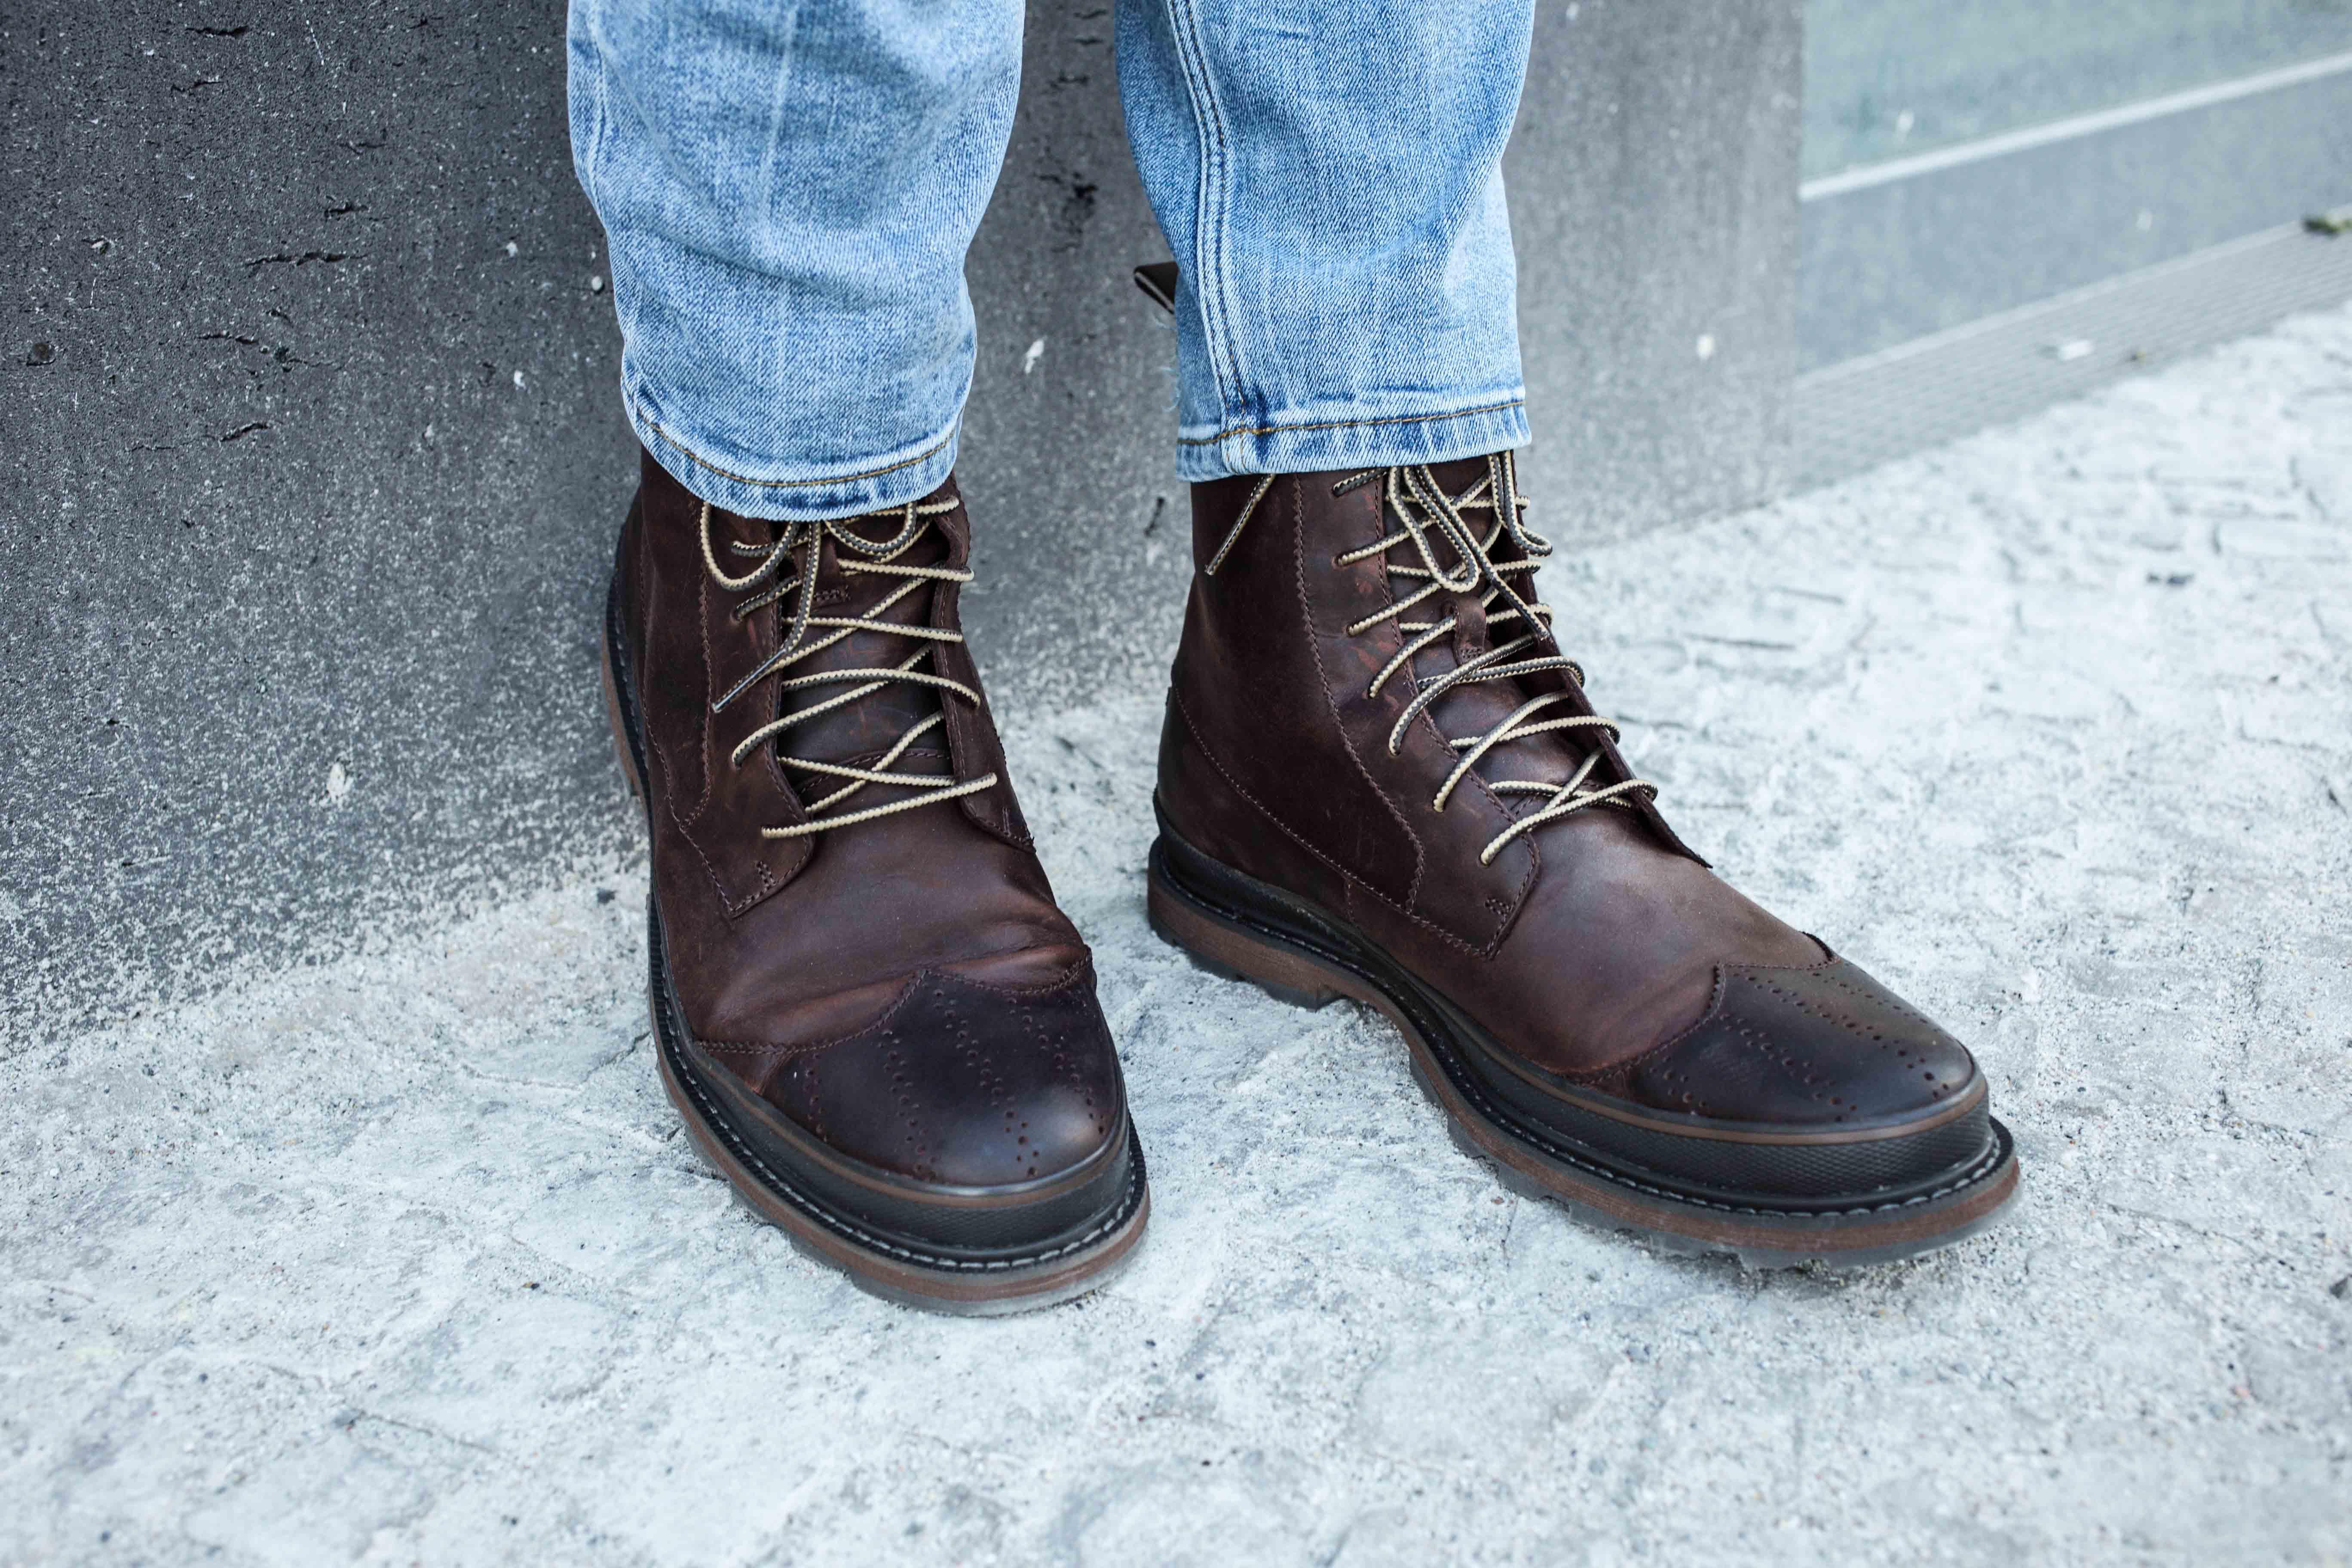 camouflage-braun-erdtöne-boots-ripped-jeans-männer-lifestyle-modeblog_6903